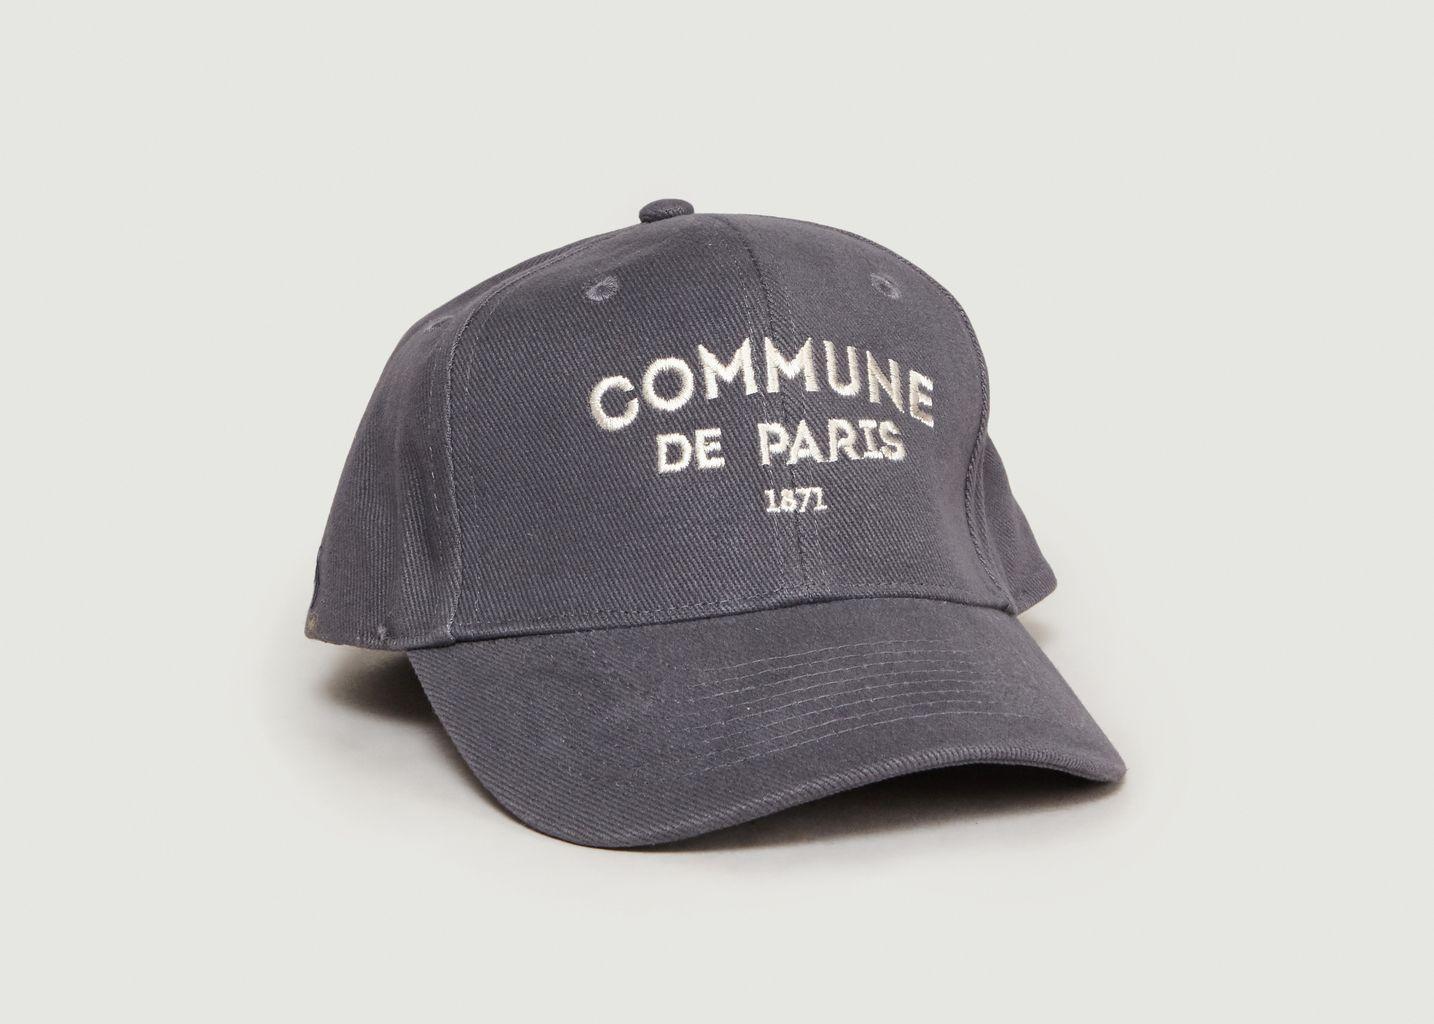 Casquette Siglée Ici - Commune de Paris